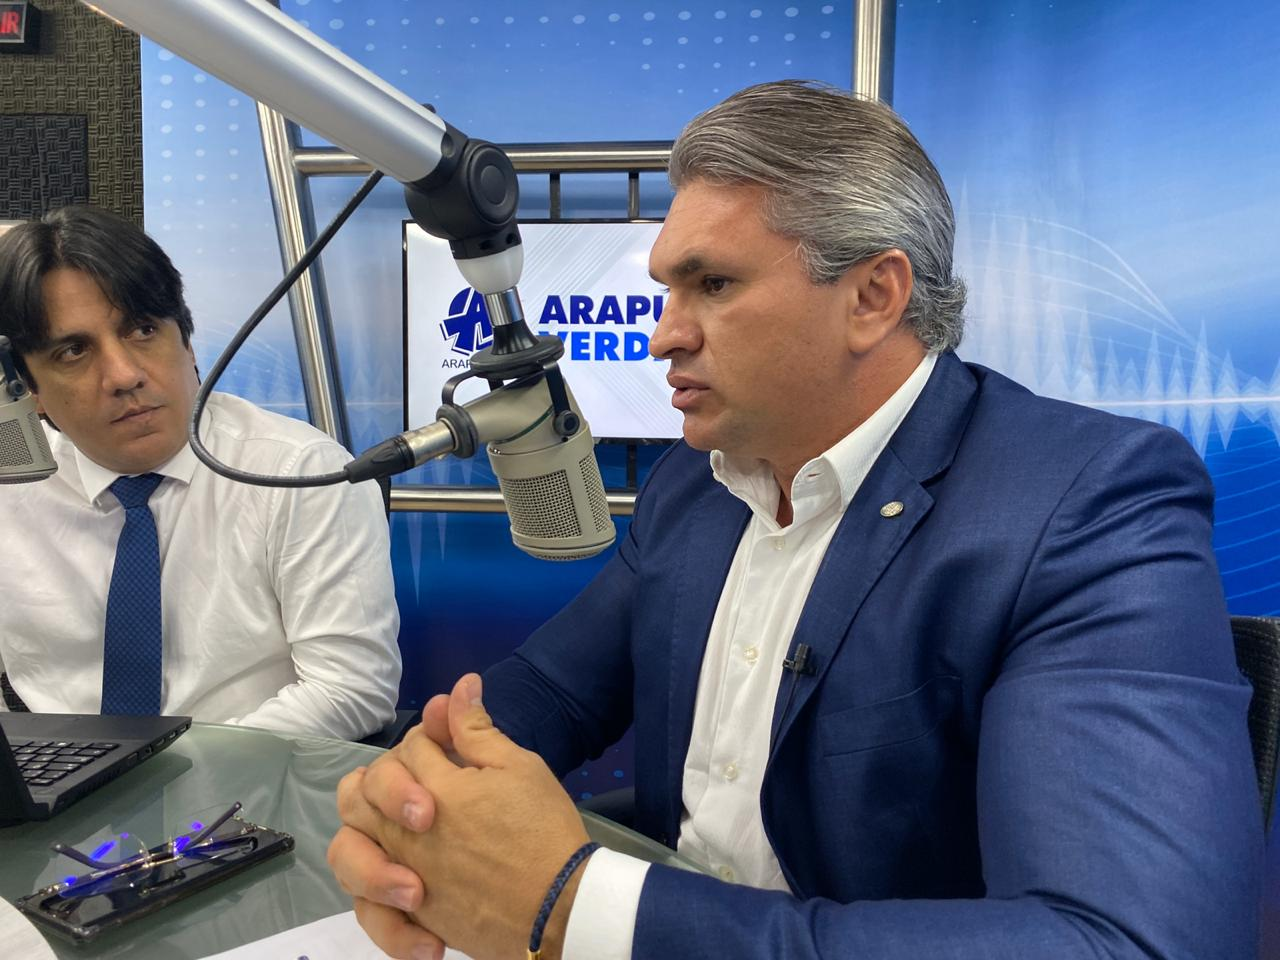 WhatsApp Image 2019 10 07 at 1.58.54 PM - 'ELE É FRACO': Julian Lemos crítica inércia de Luciano Cartaxo -  VEJA VÍDEO